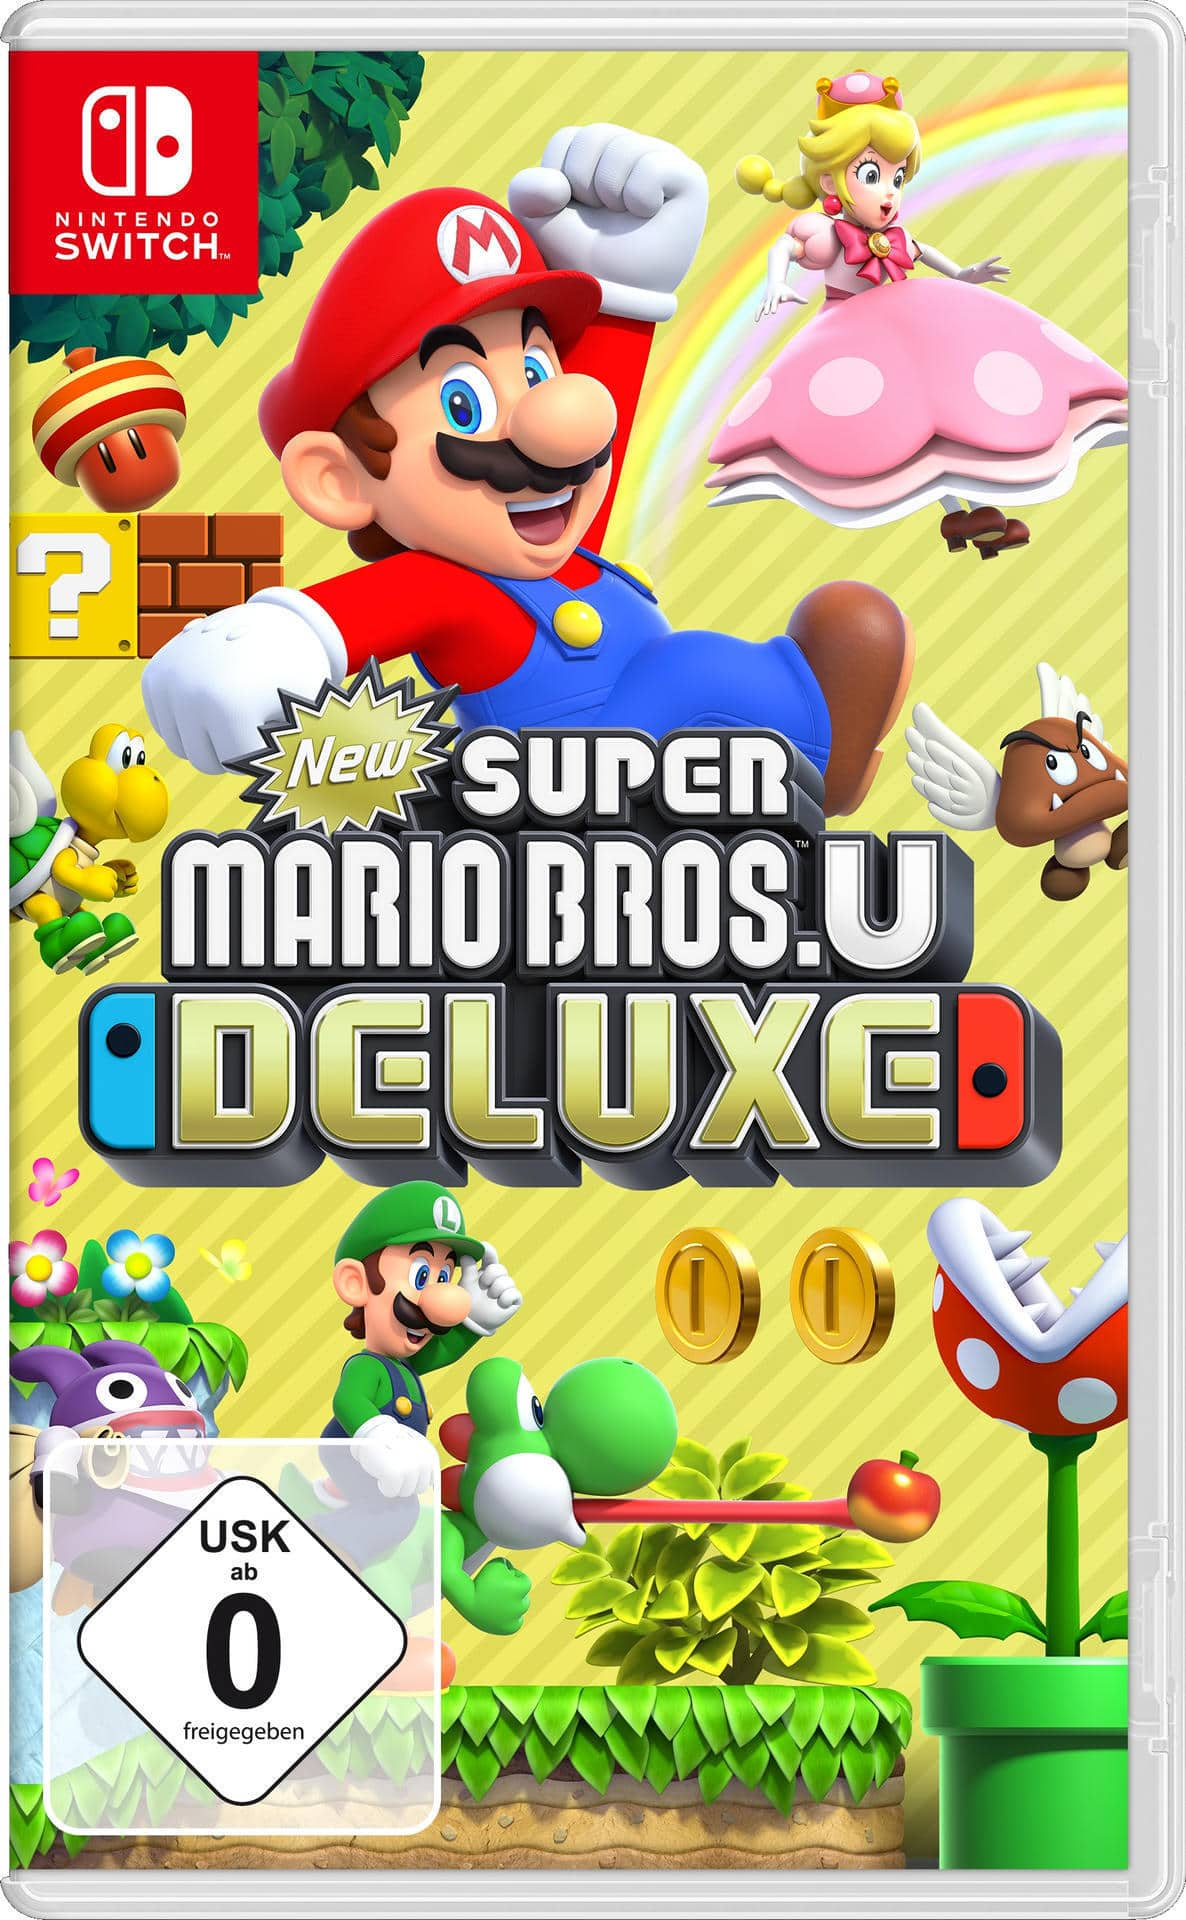 New Super Mario Bros. U Deluxe (Nintendo Switch) für 54,99 Euro